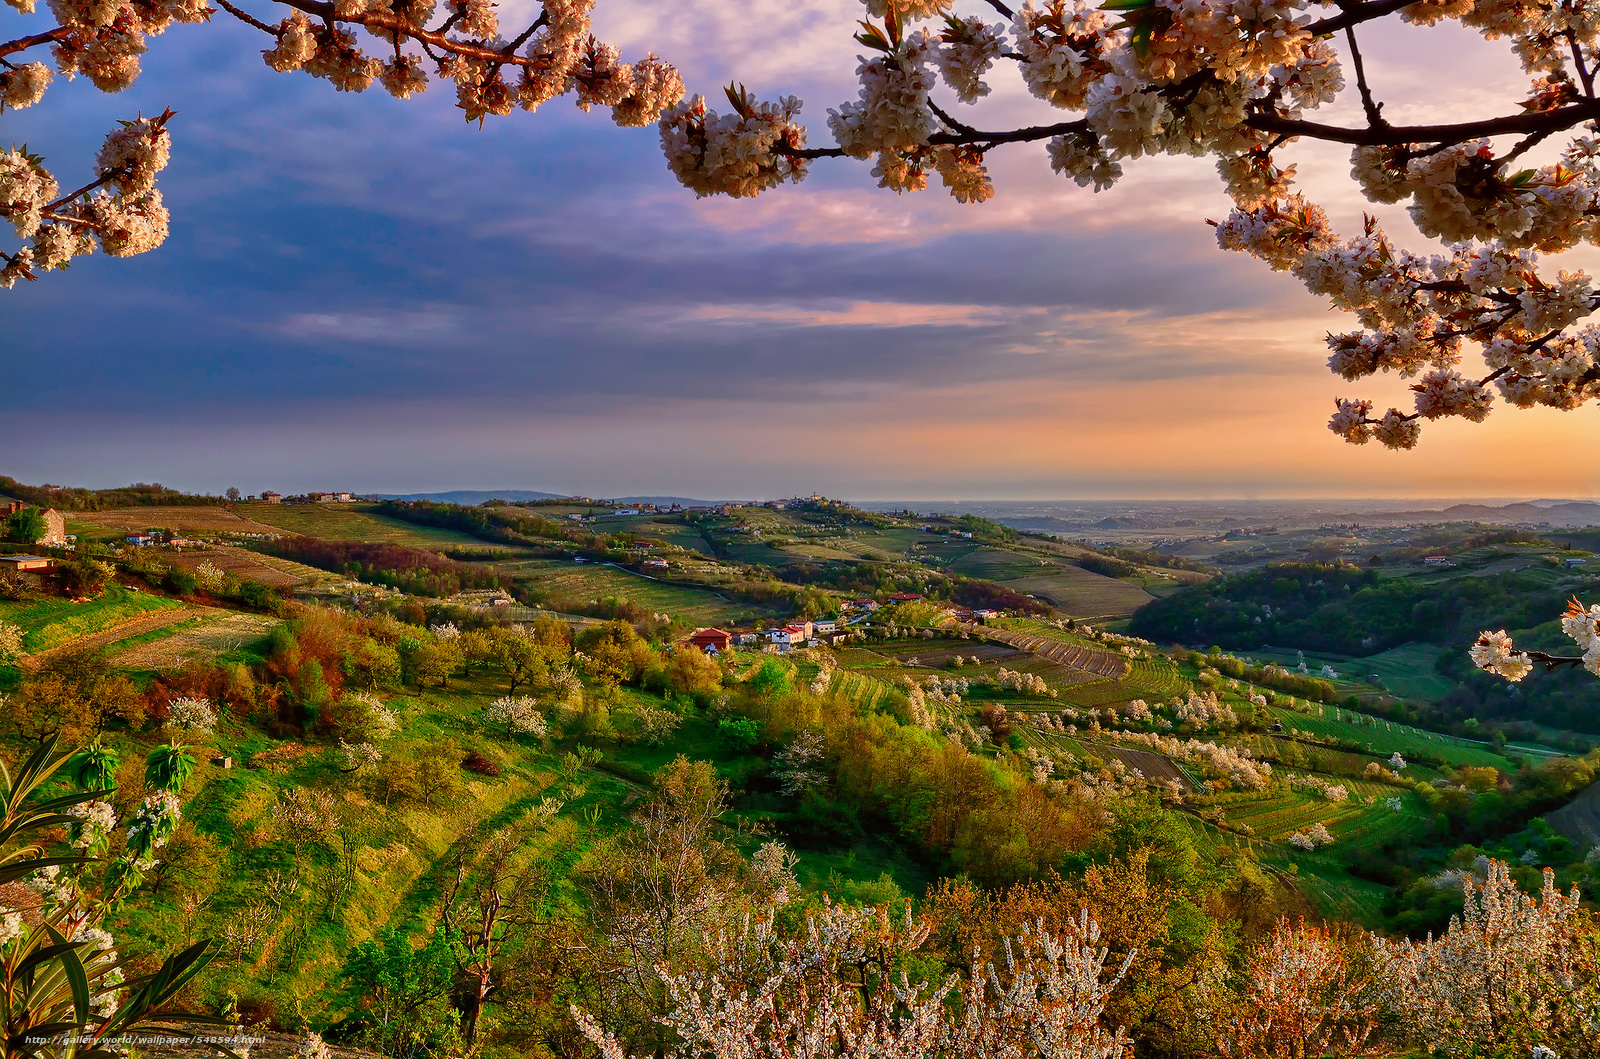 Scaricare gli sfondi lombardia collio italia primavera for Sfondi desktop gratis primavera